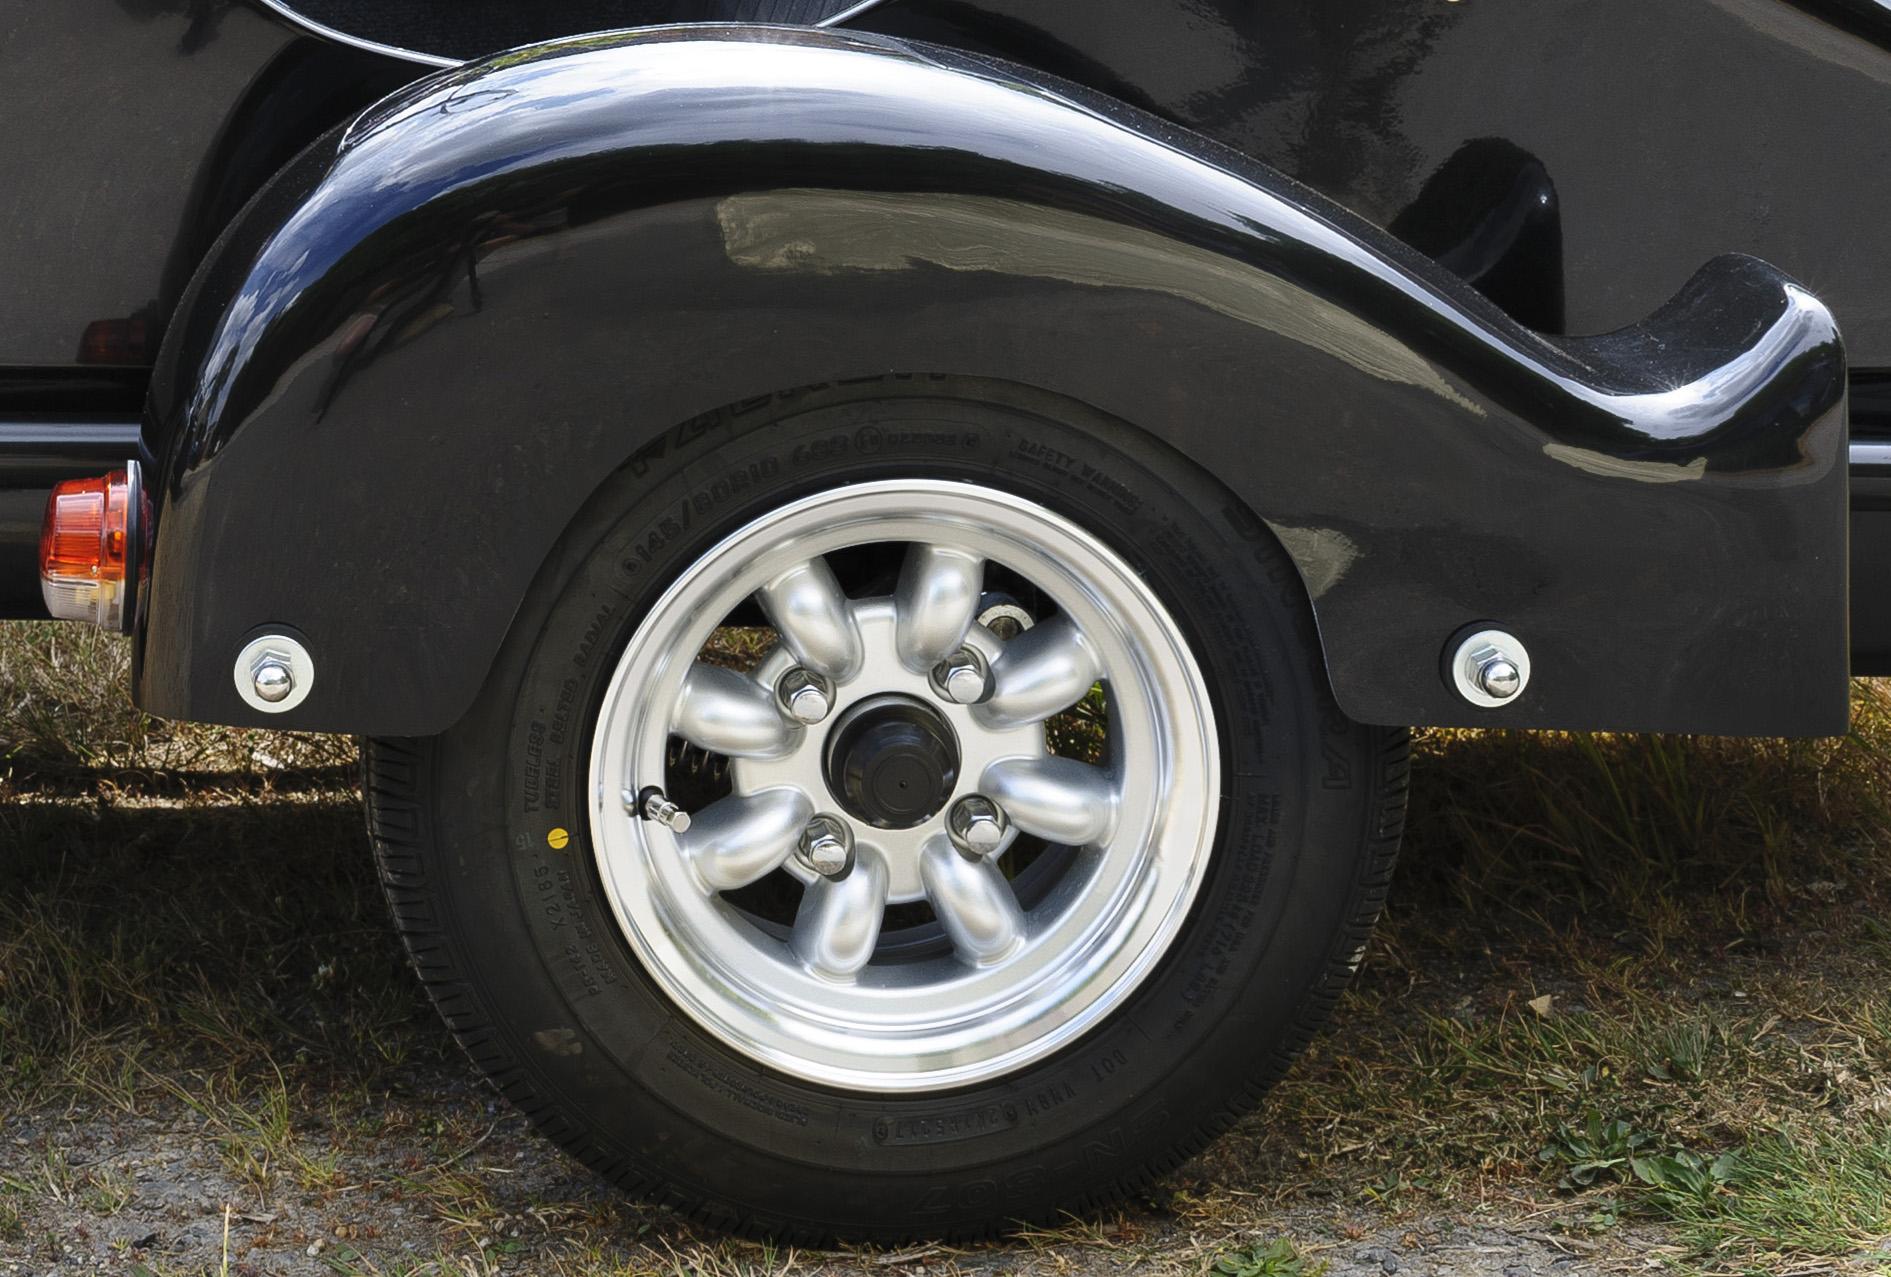 Sidecar Prices - Watsonian Sidecars